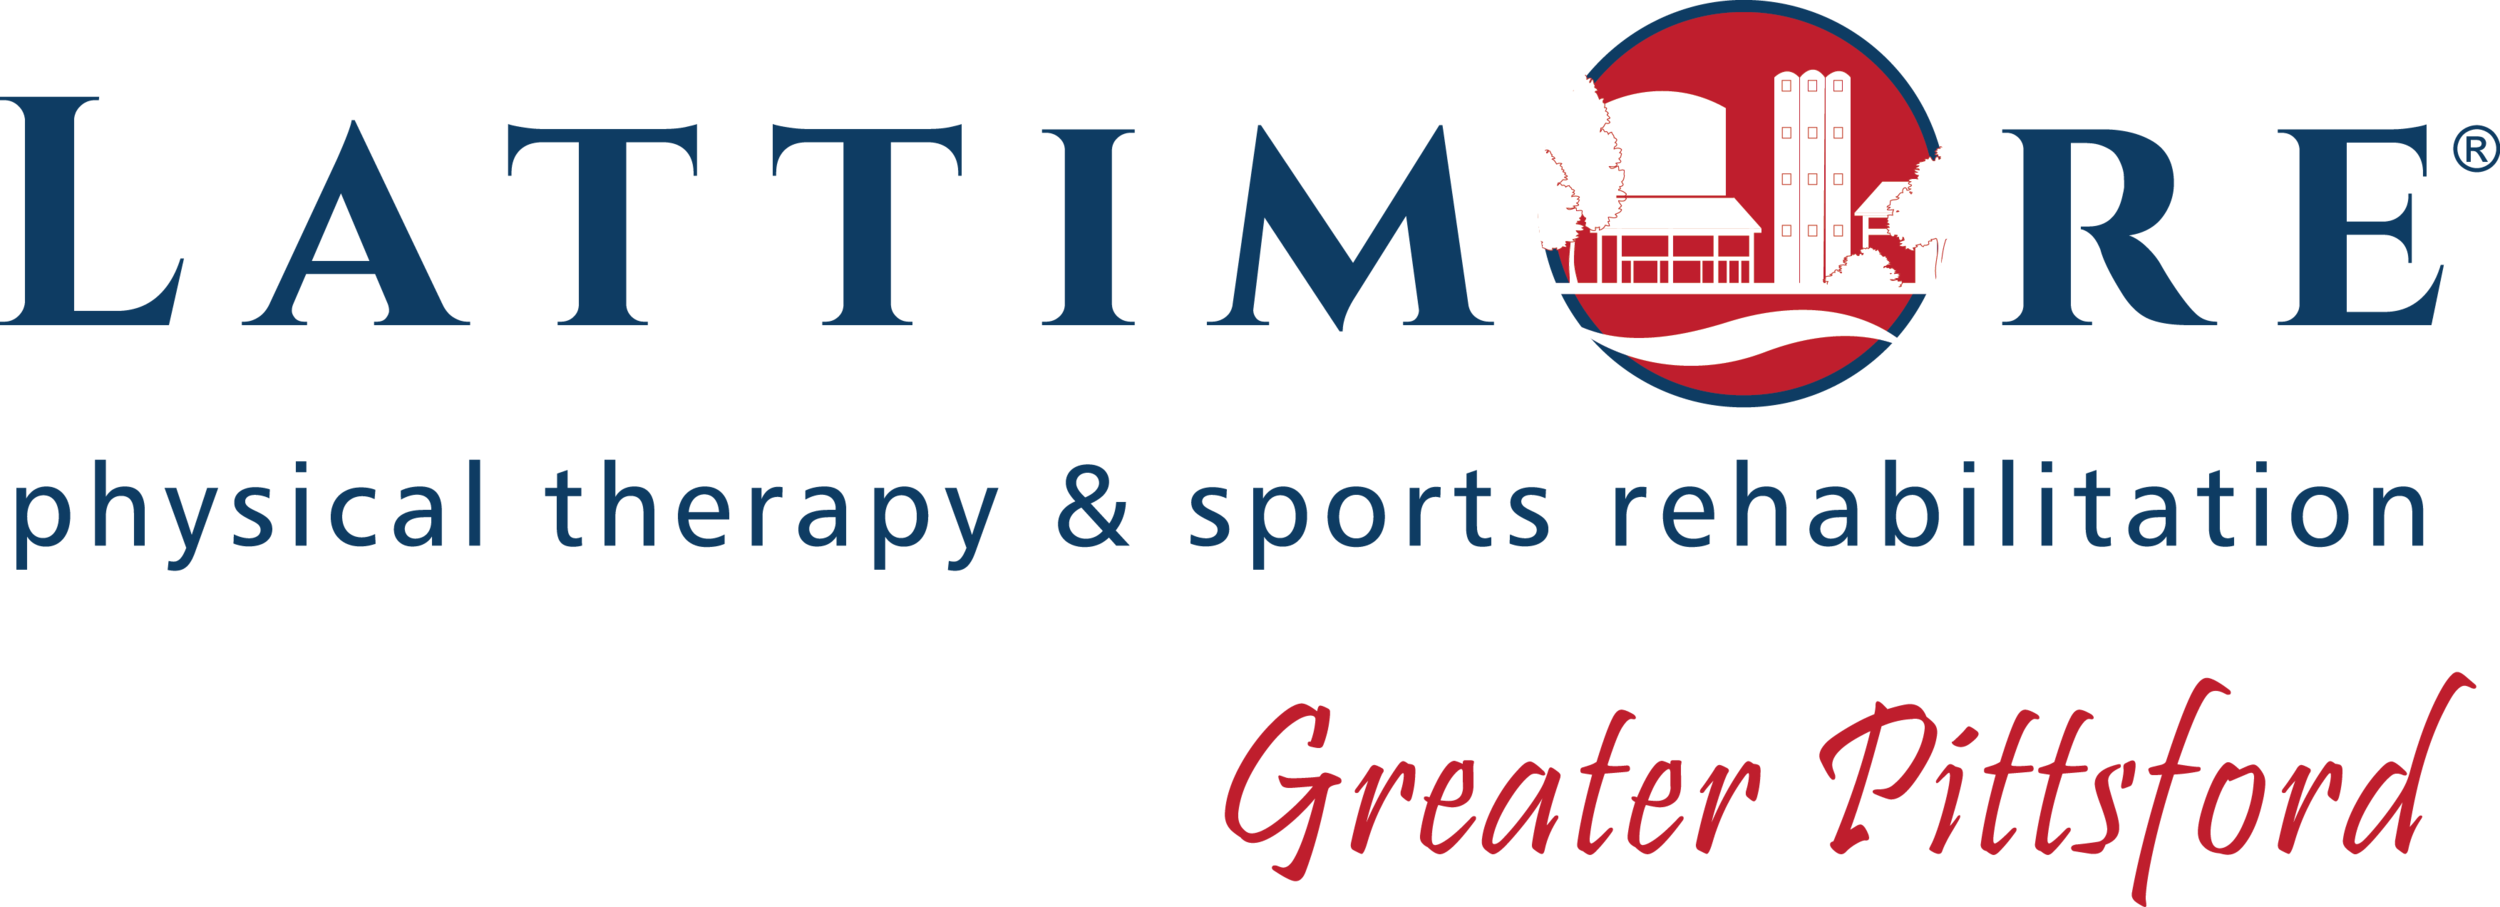 2019-05_Lattimore-Logo-GreaterPittsford.png